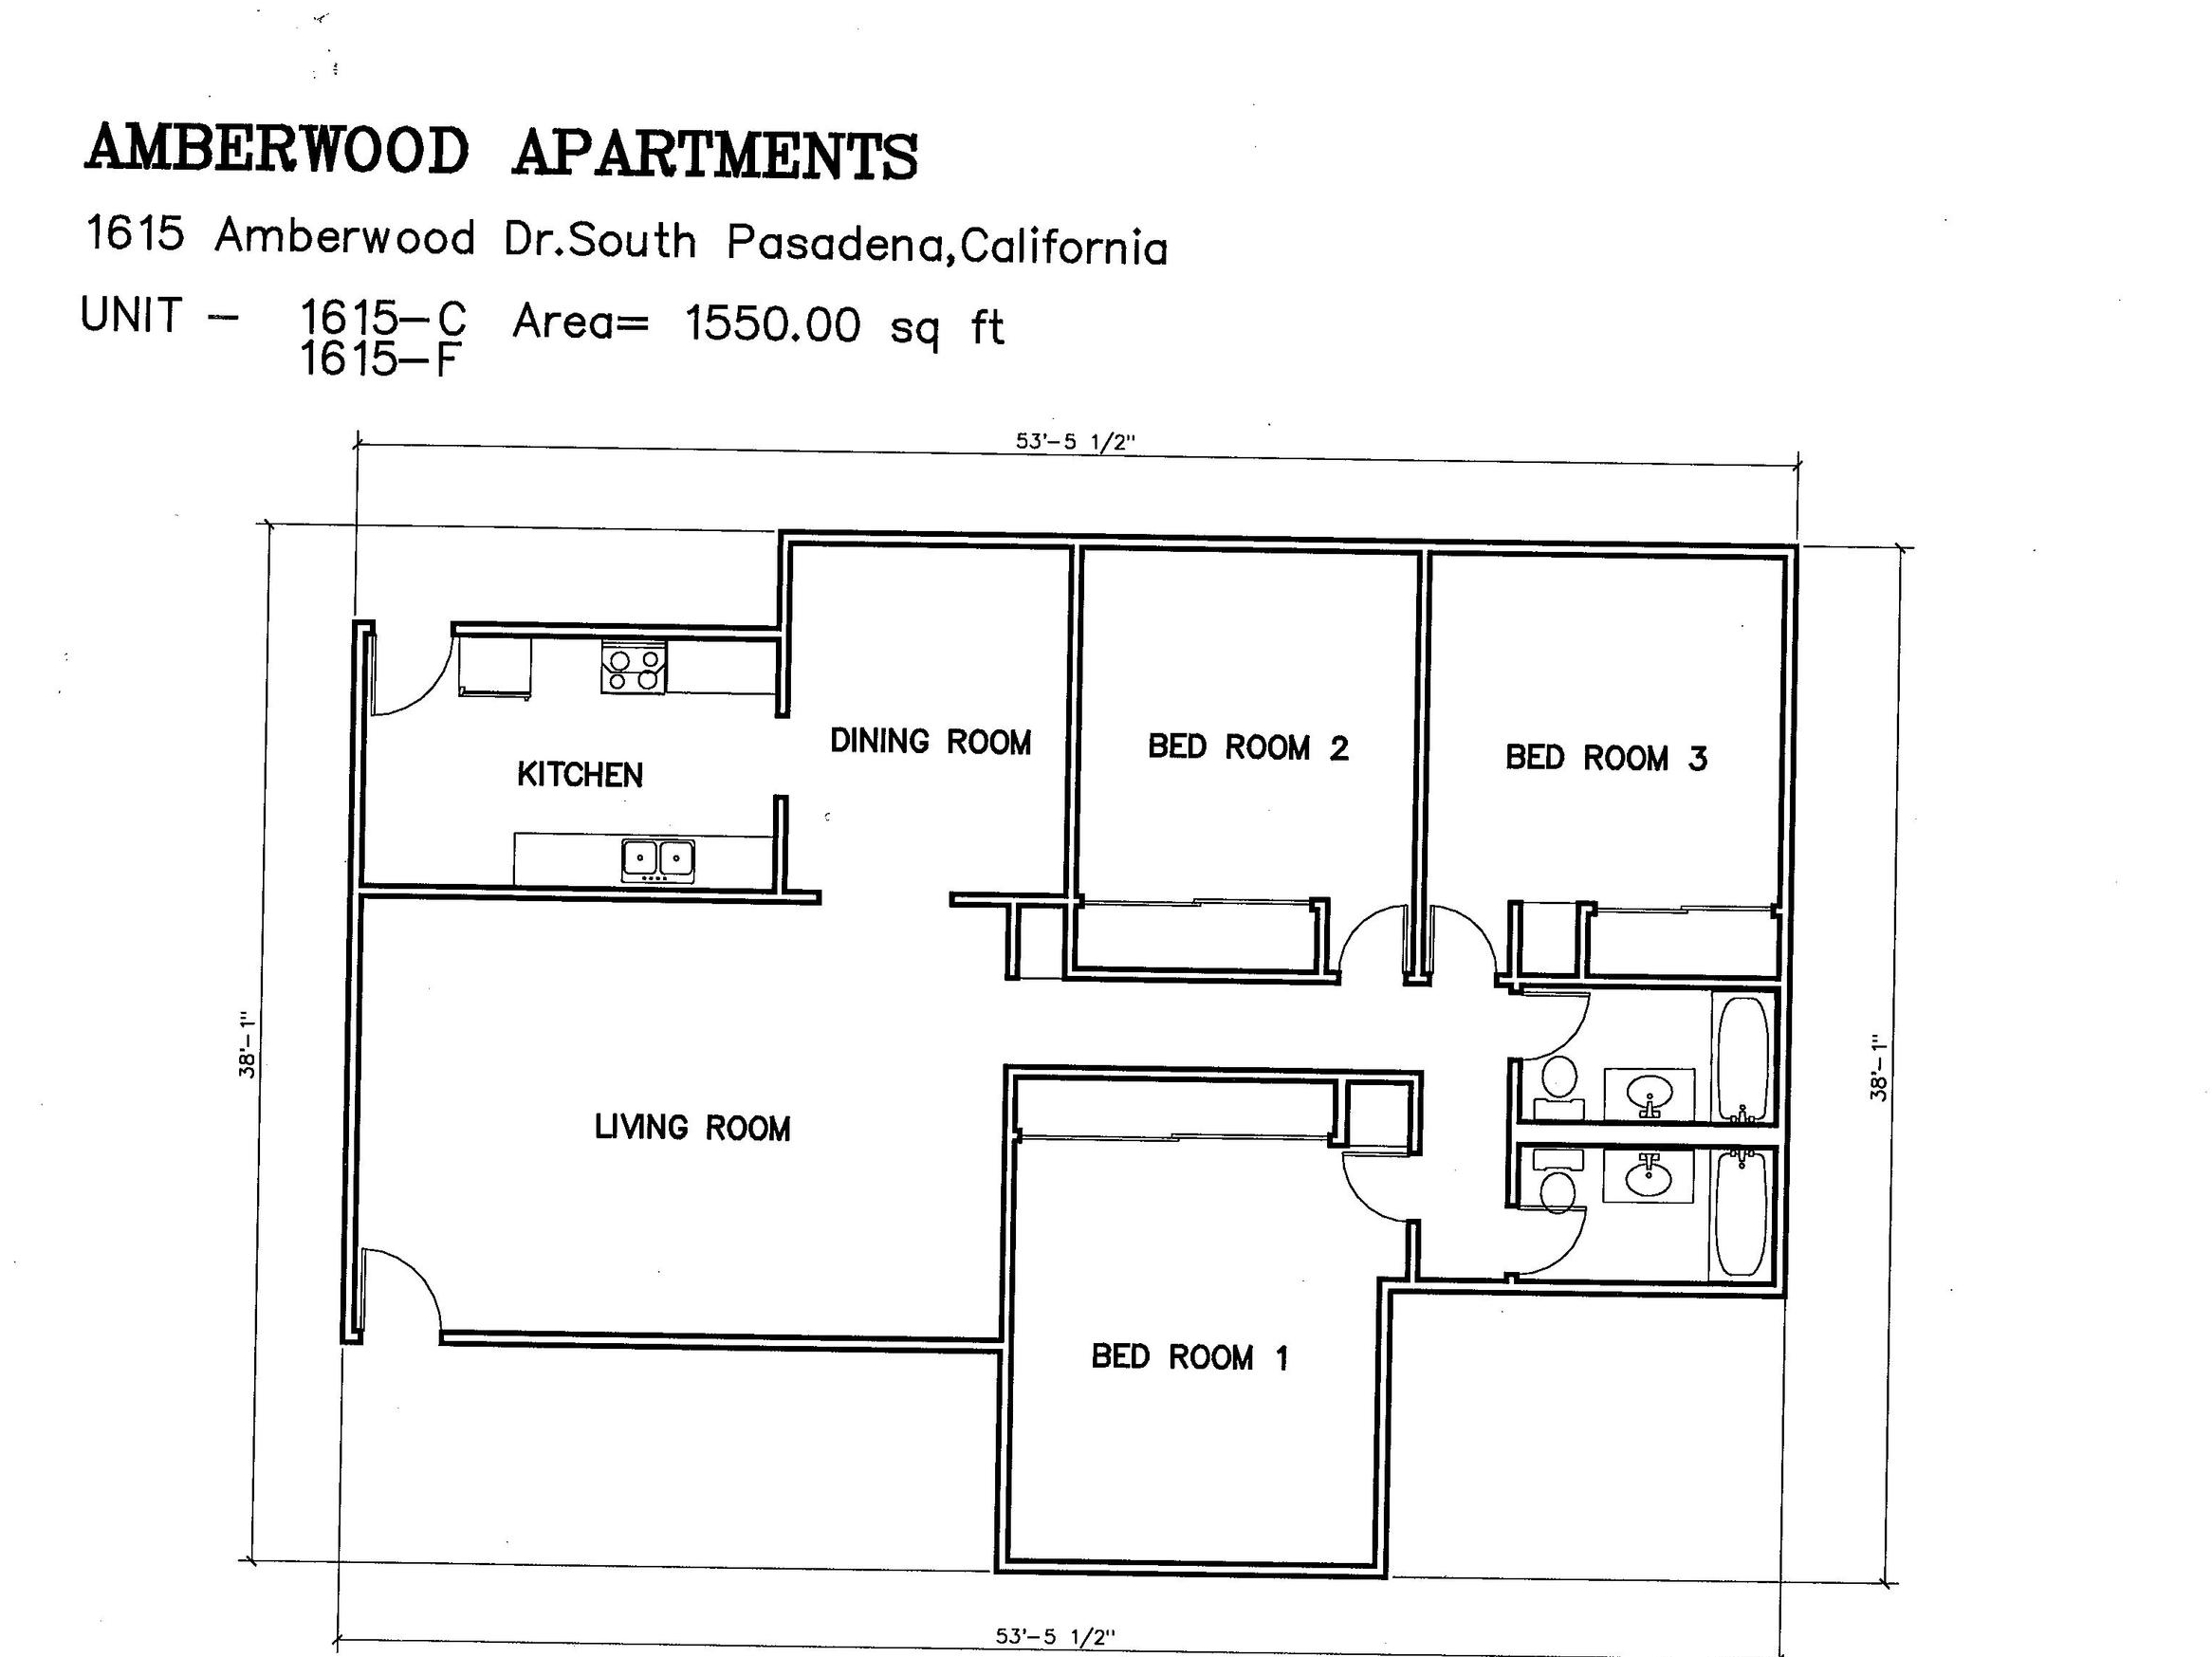 1615 Amberwood Dr Floor Plans Icm Resources Inc